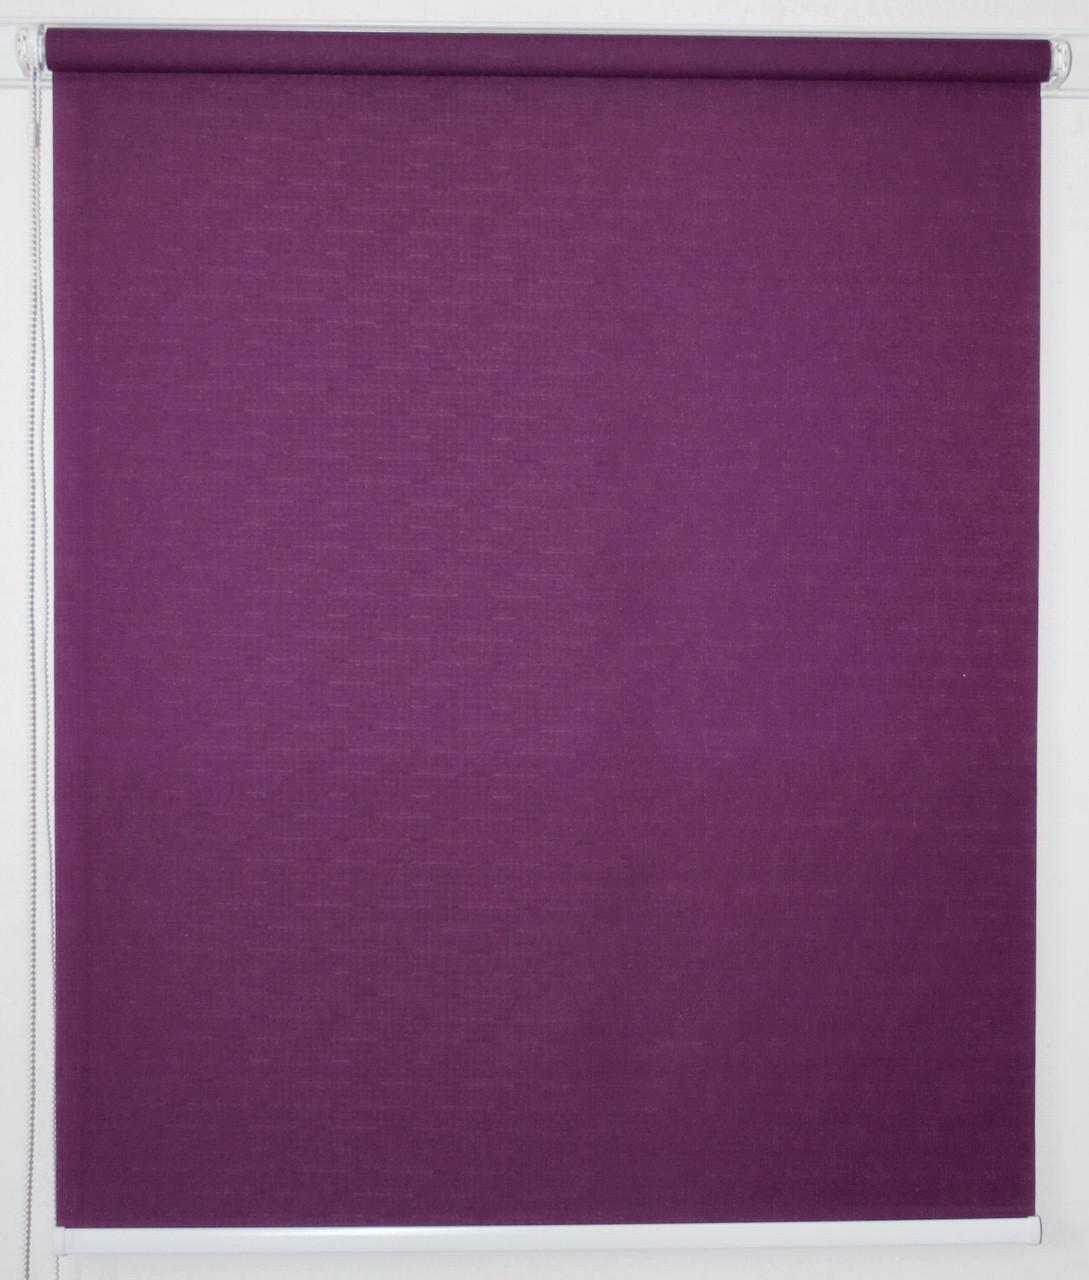 Рулонная штора 500*1500 Лён 613 Фиолетовый